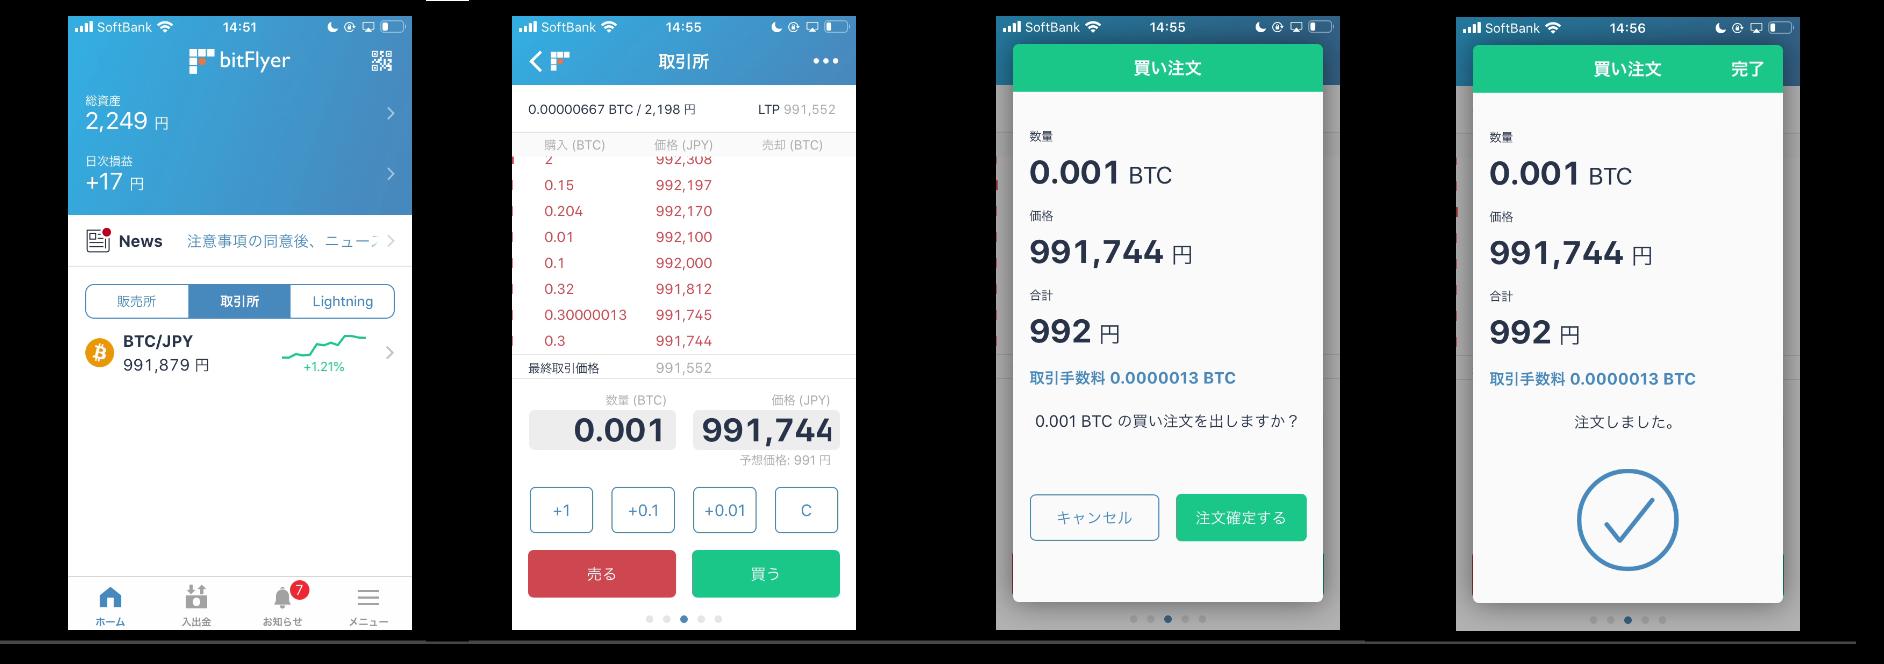 Bitflyer wallet 7